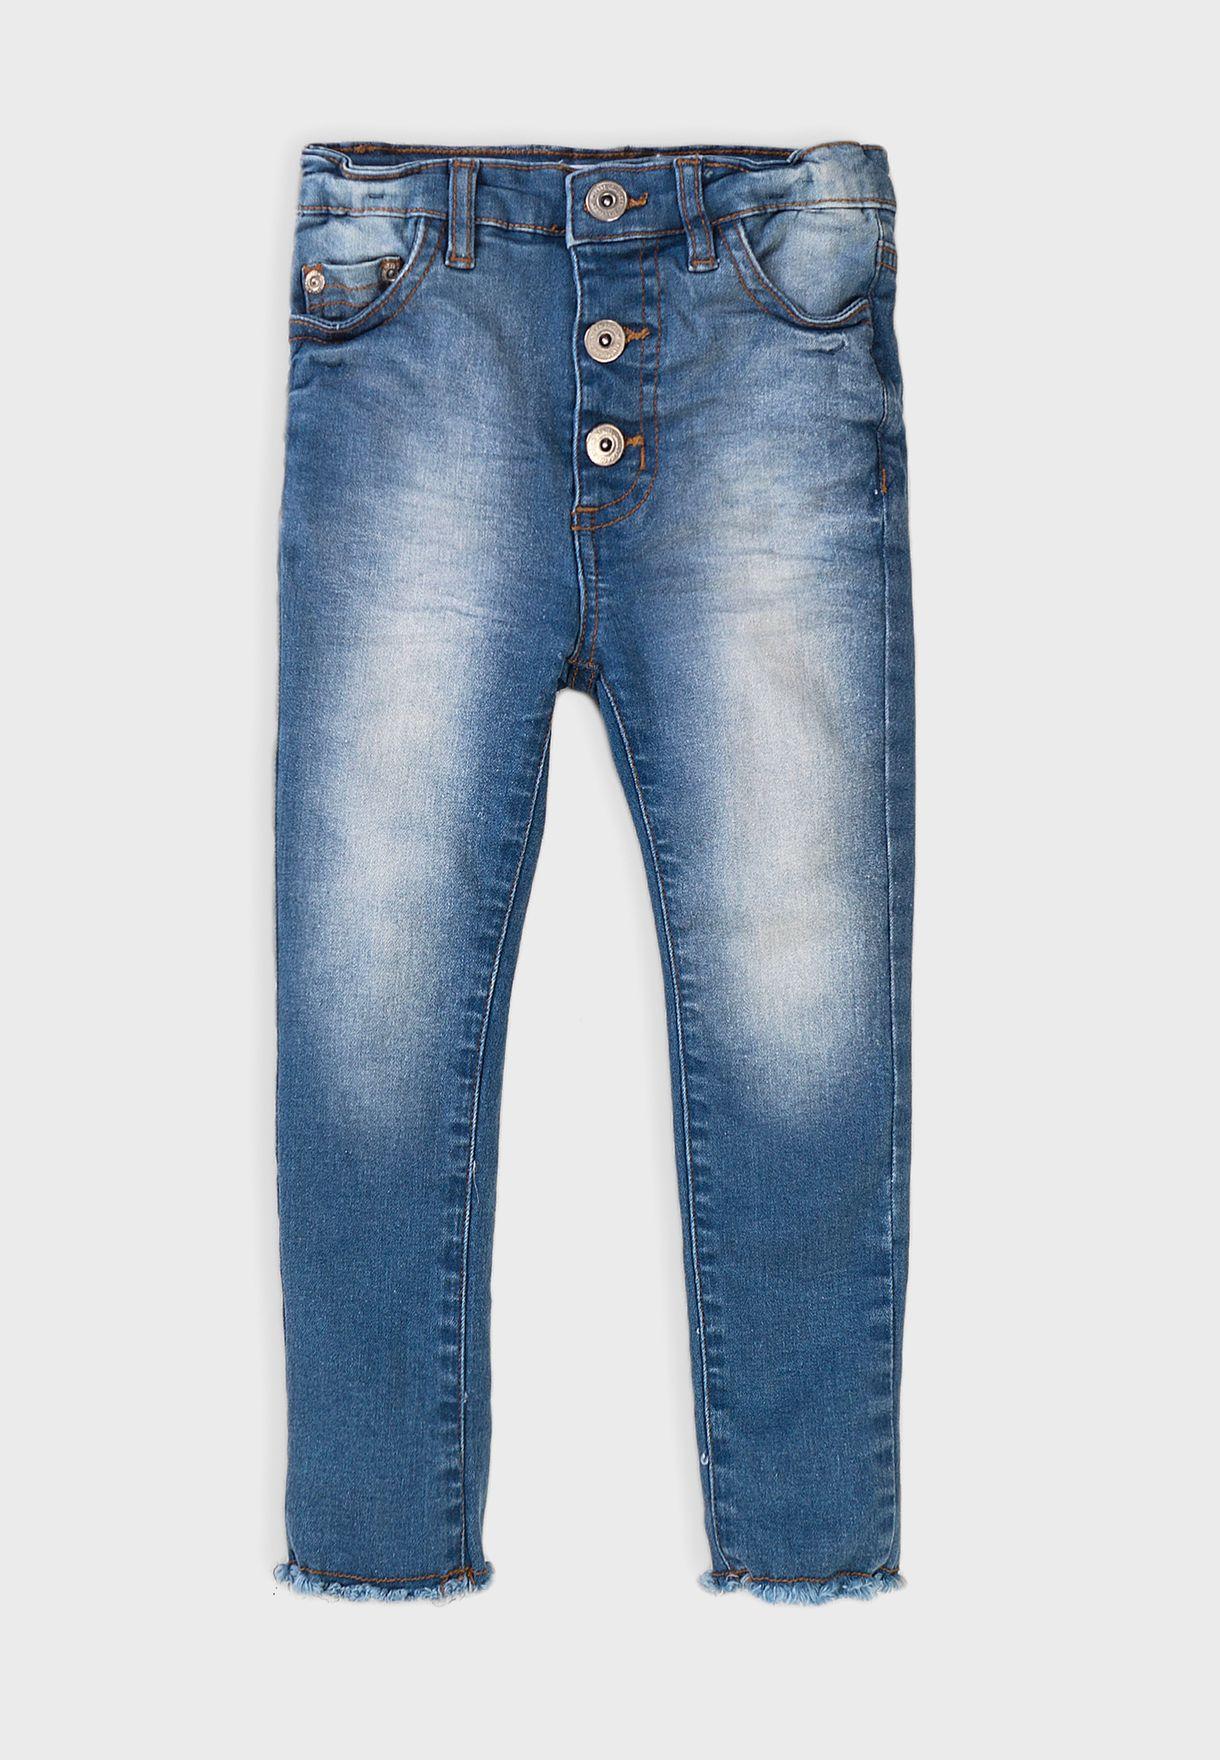 Infant High Waist Basic Super Skinny Jeans